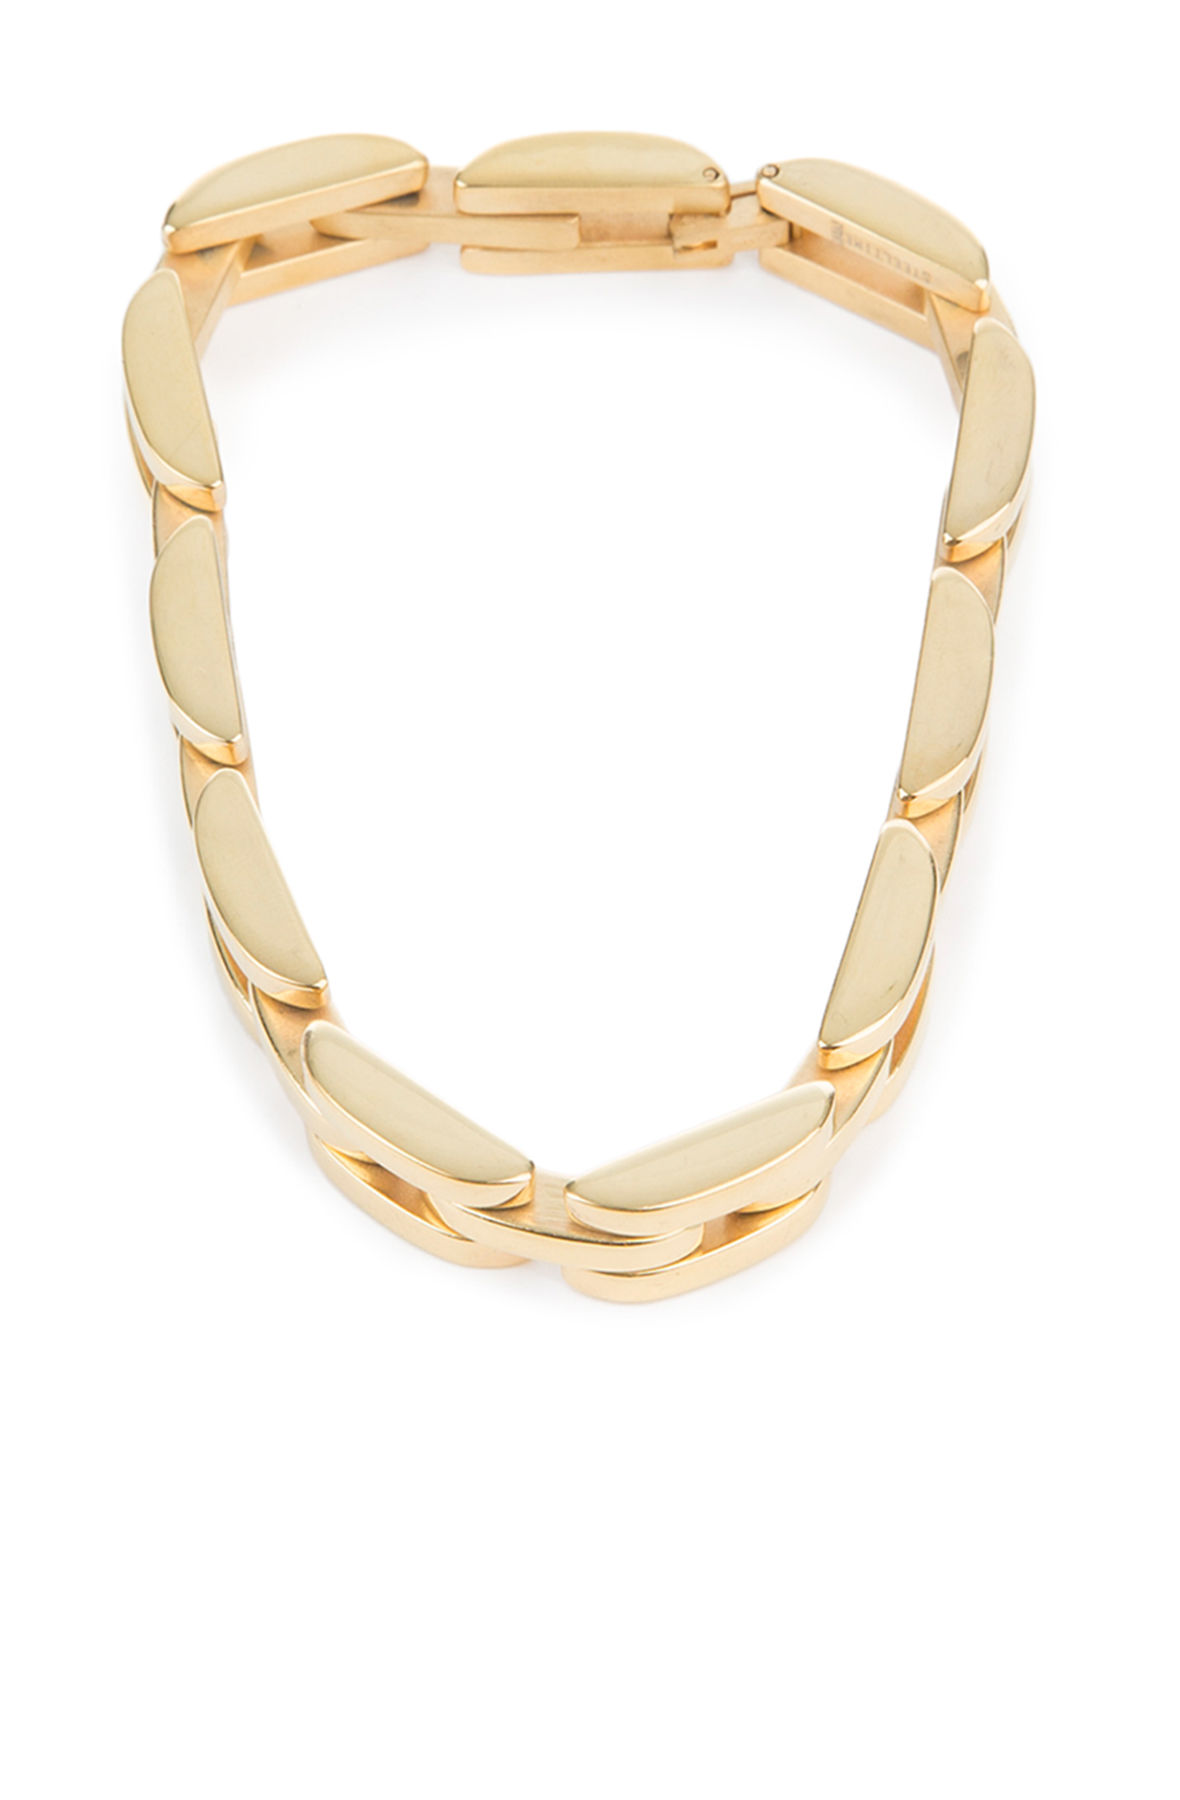 the portmouth bracelet in gold